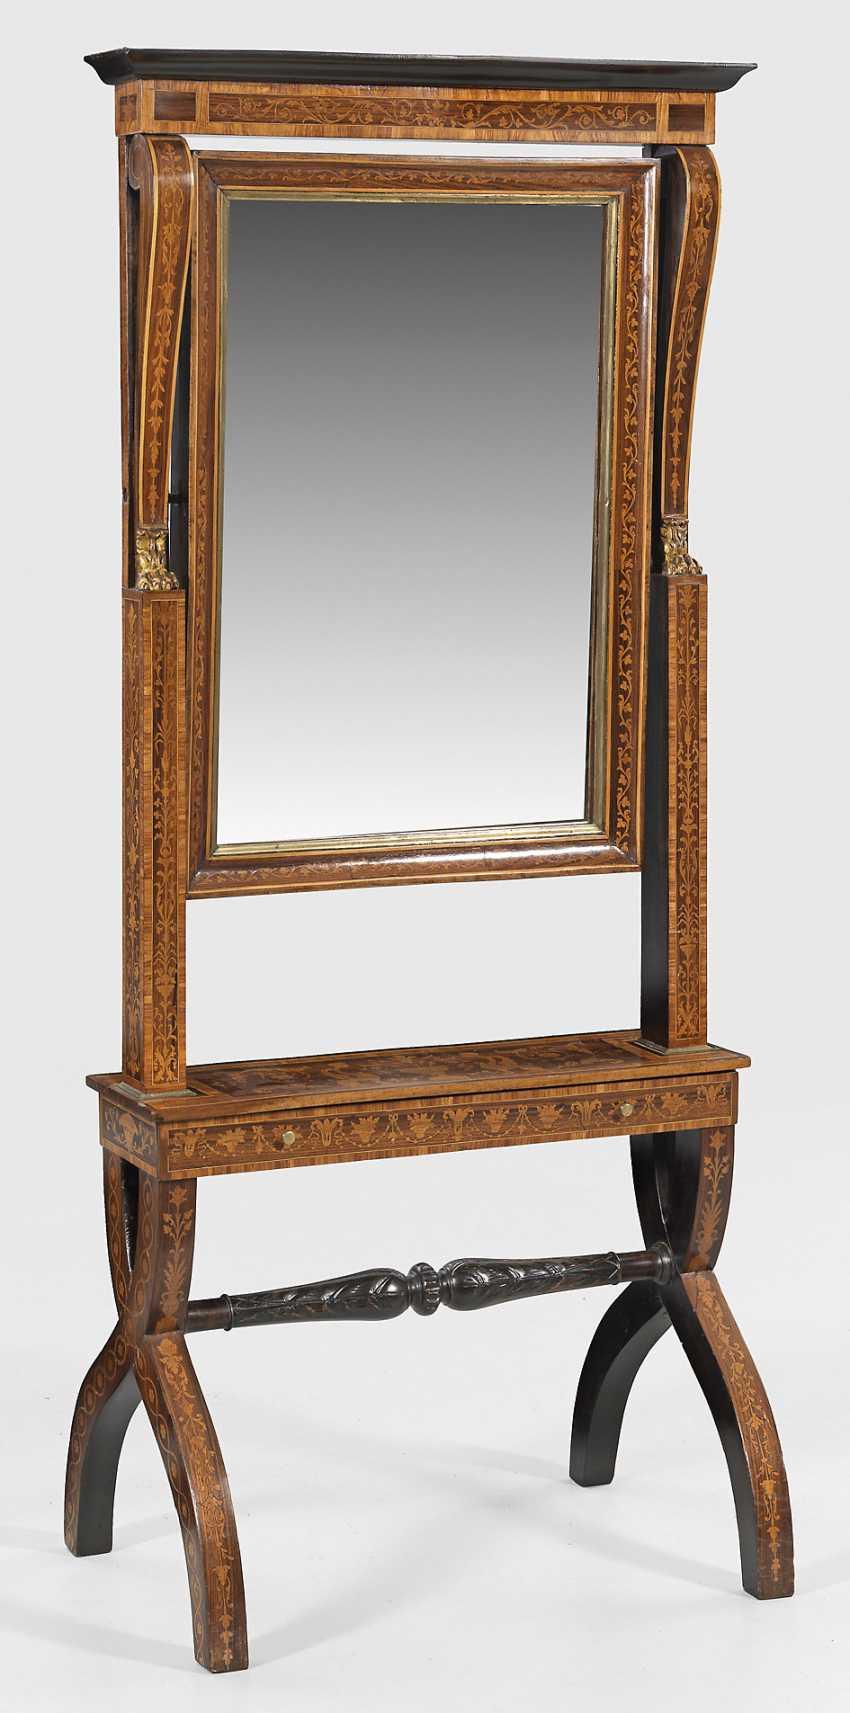 Lombard Standing Mirror - photo 1